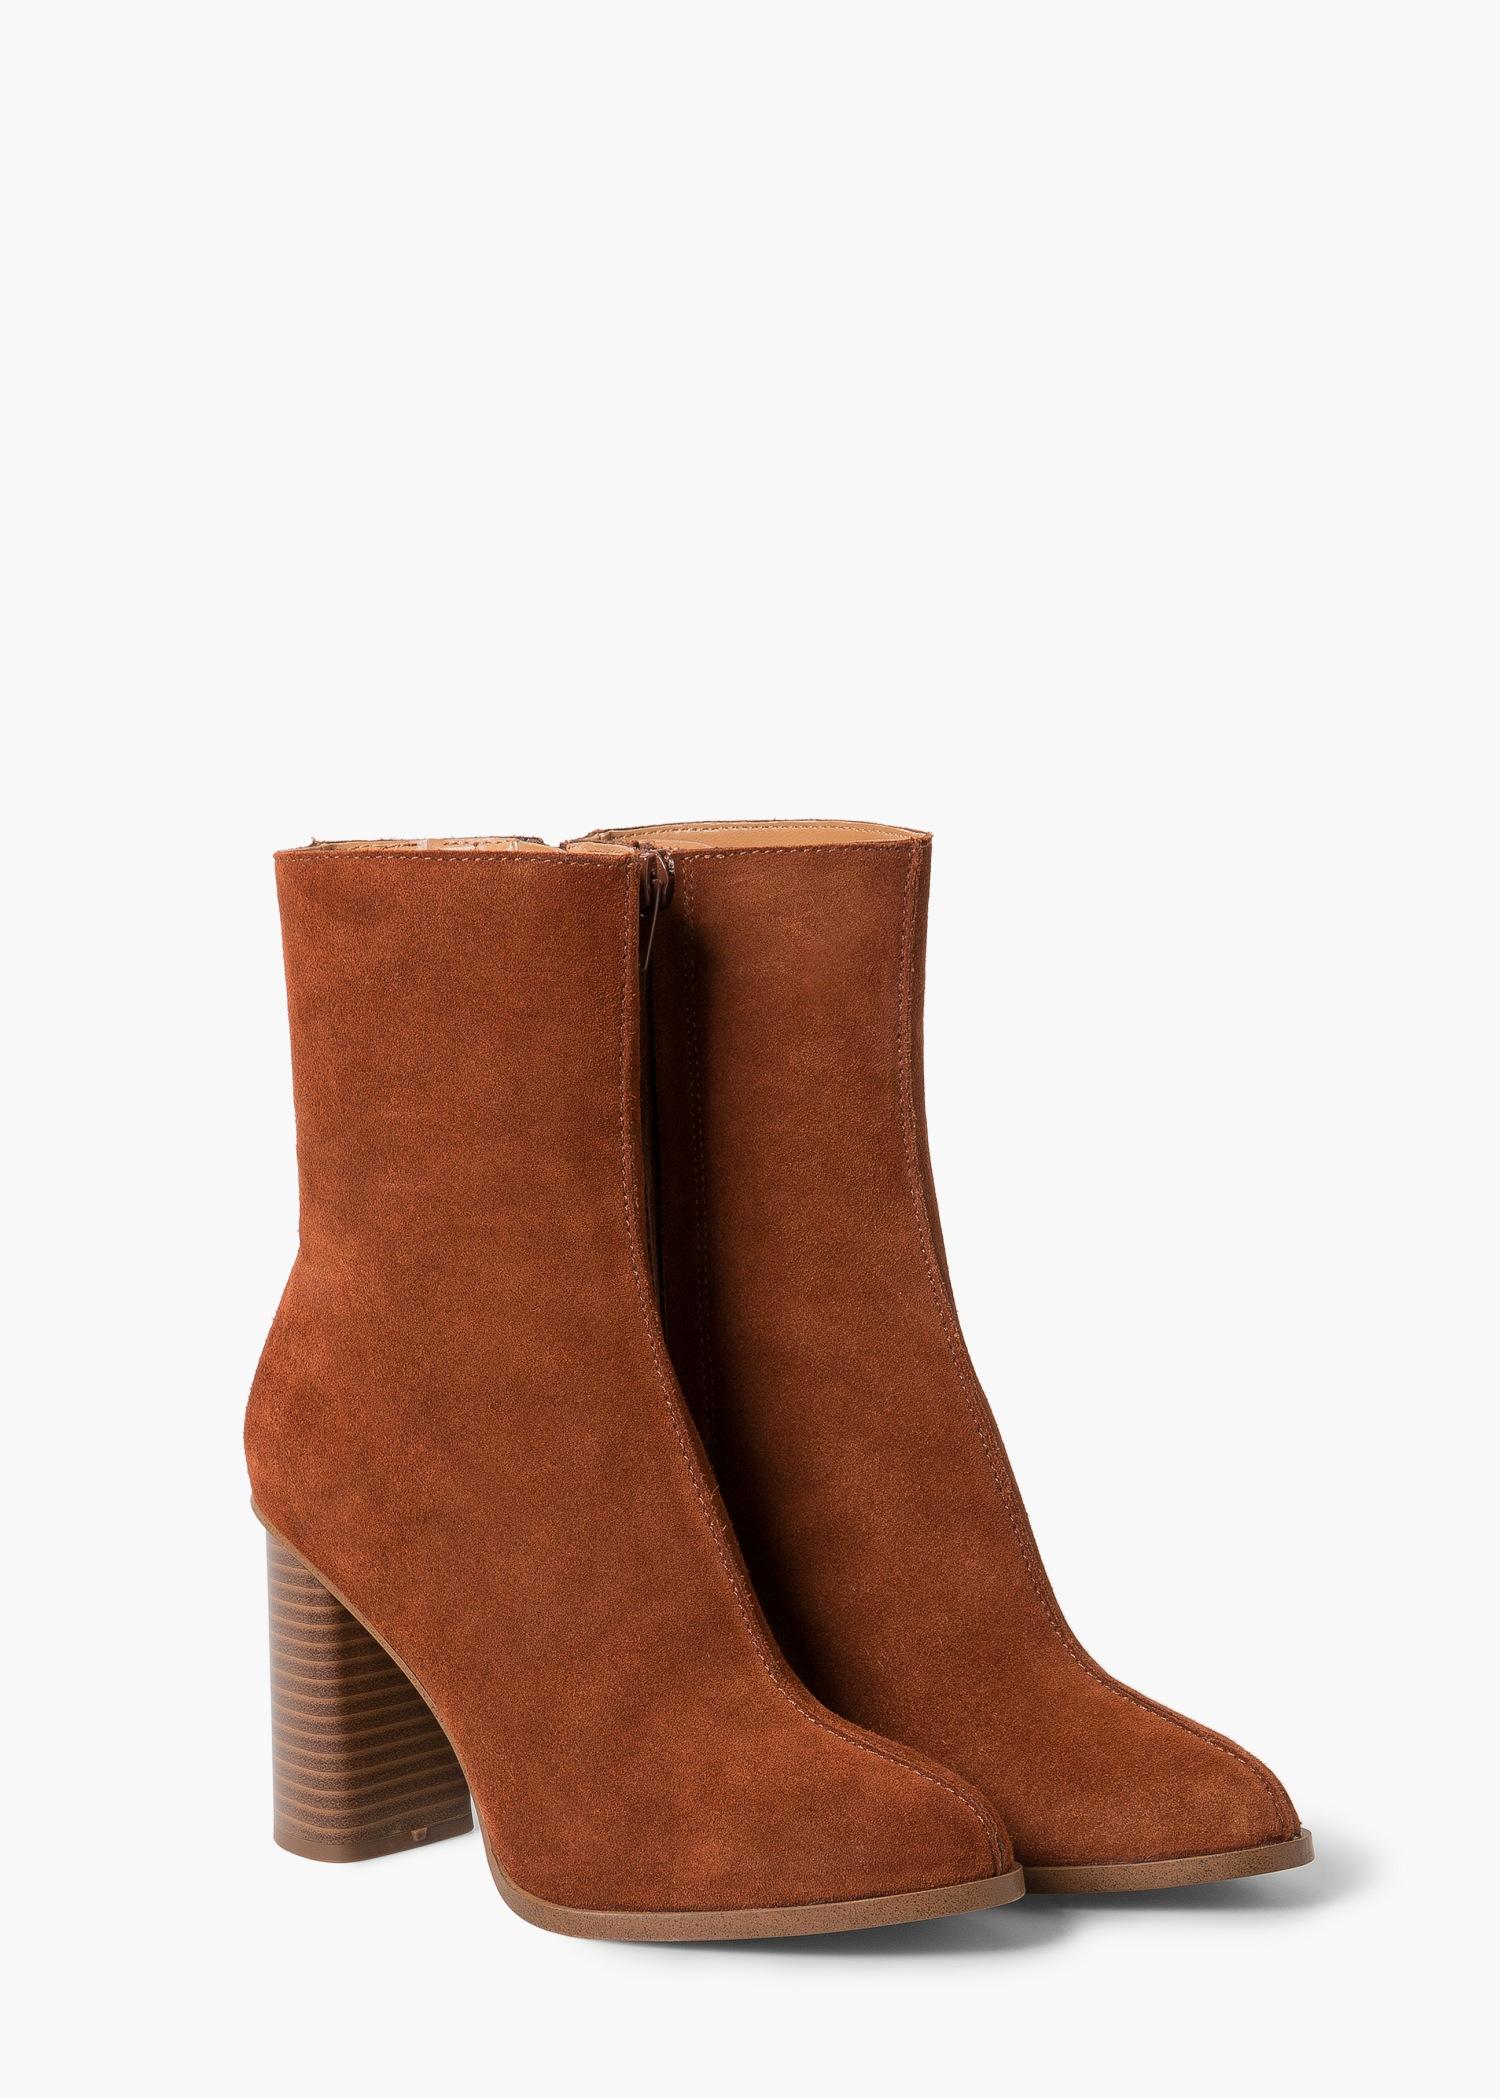 7926332289c Mango Orange Heel Suede Ankle Boot